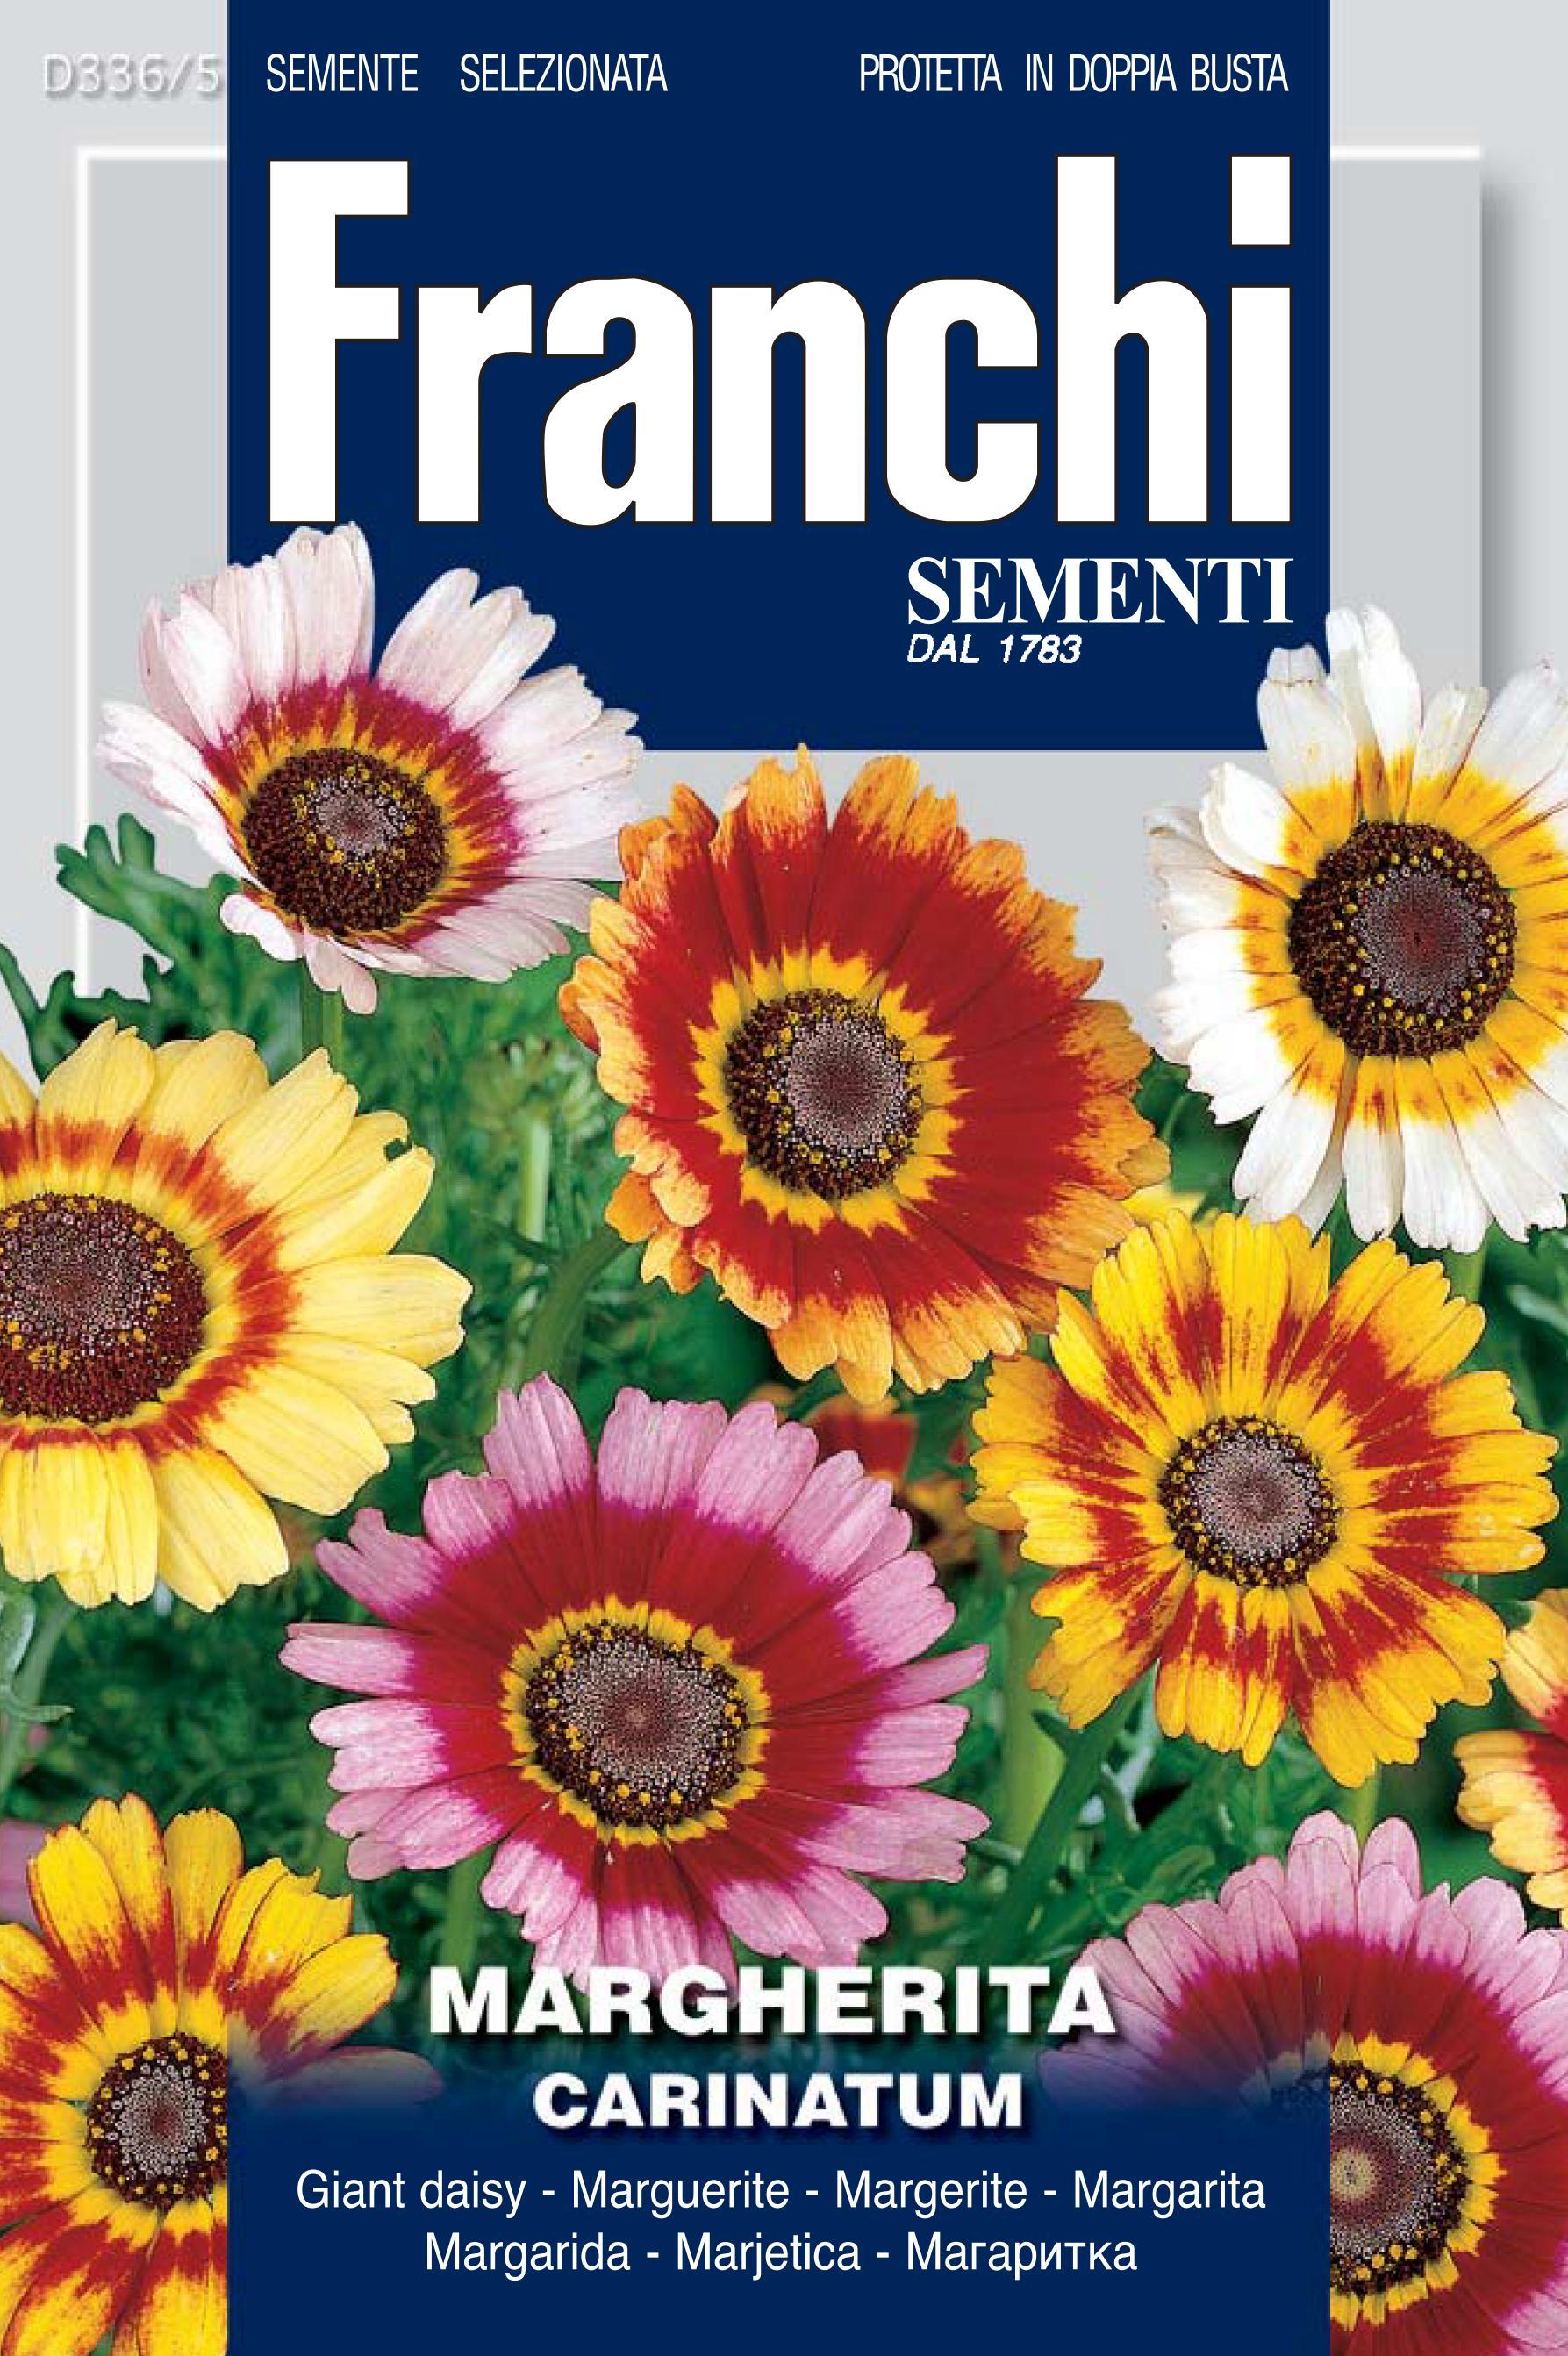 Giant daisy Carinatum